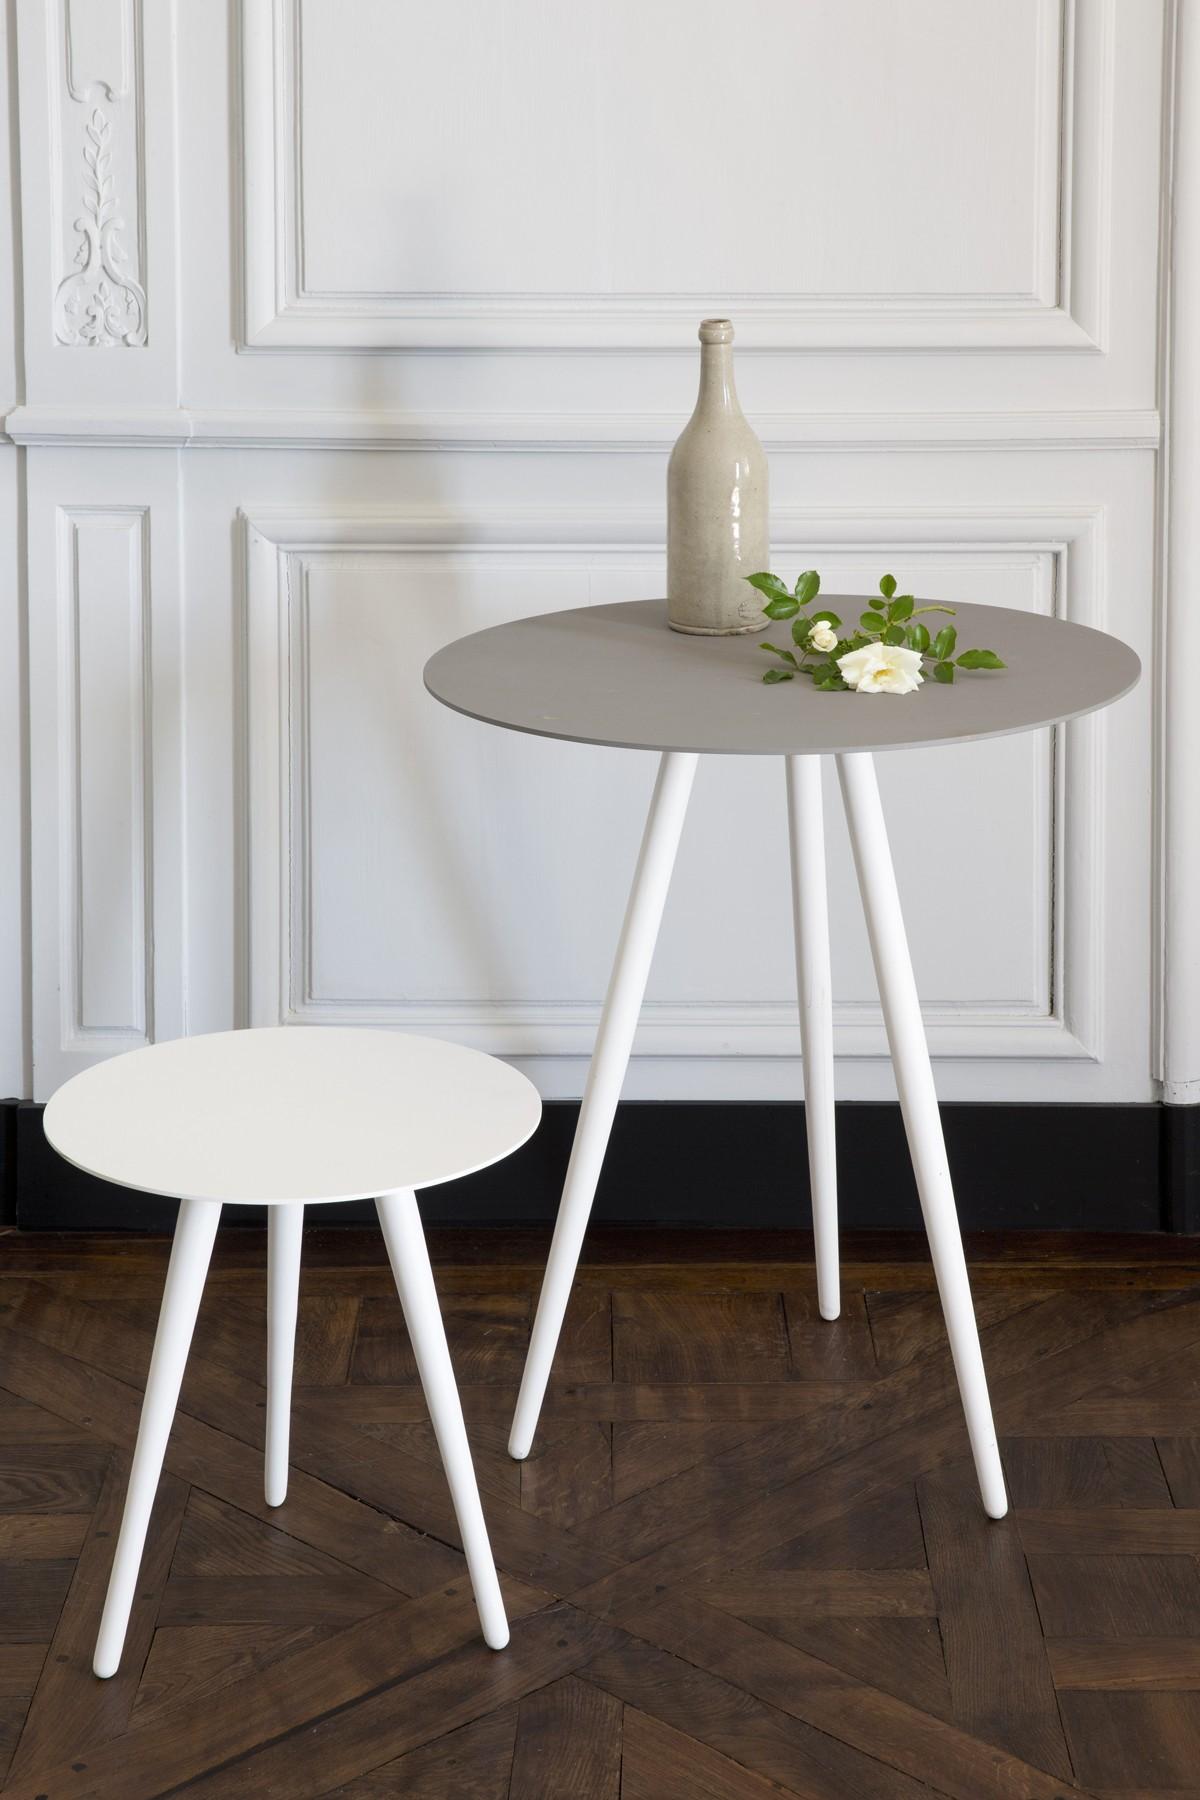 Swan Table - Résistub Productions